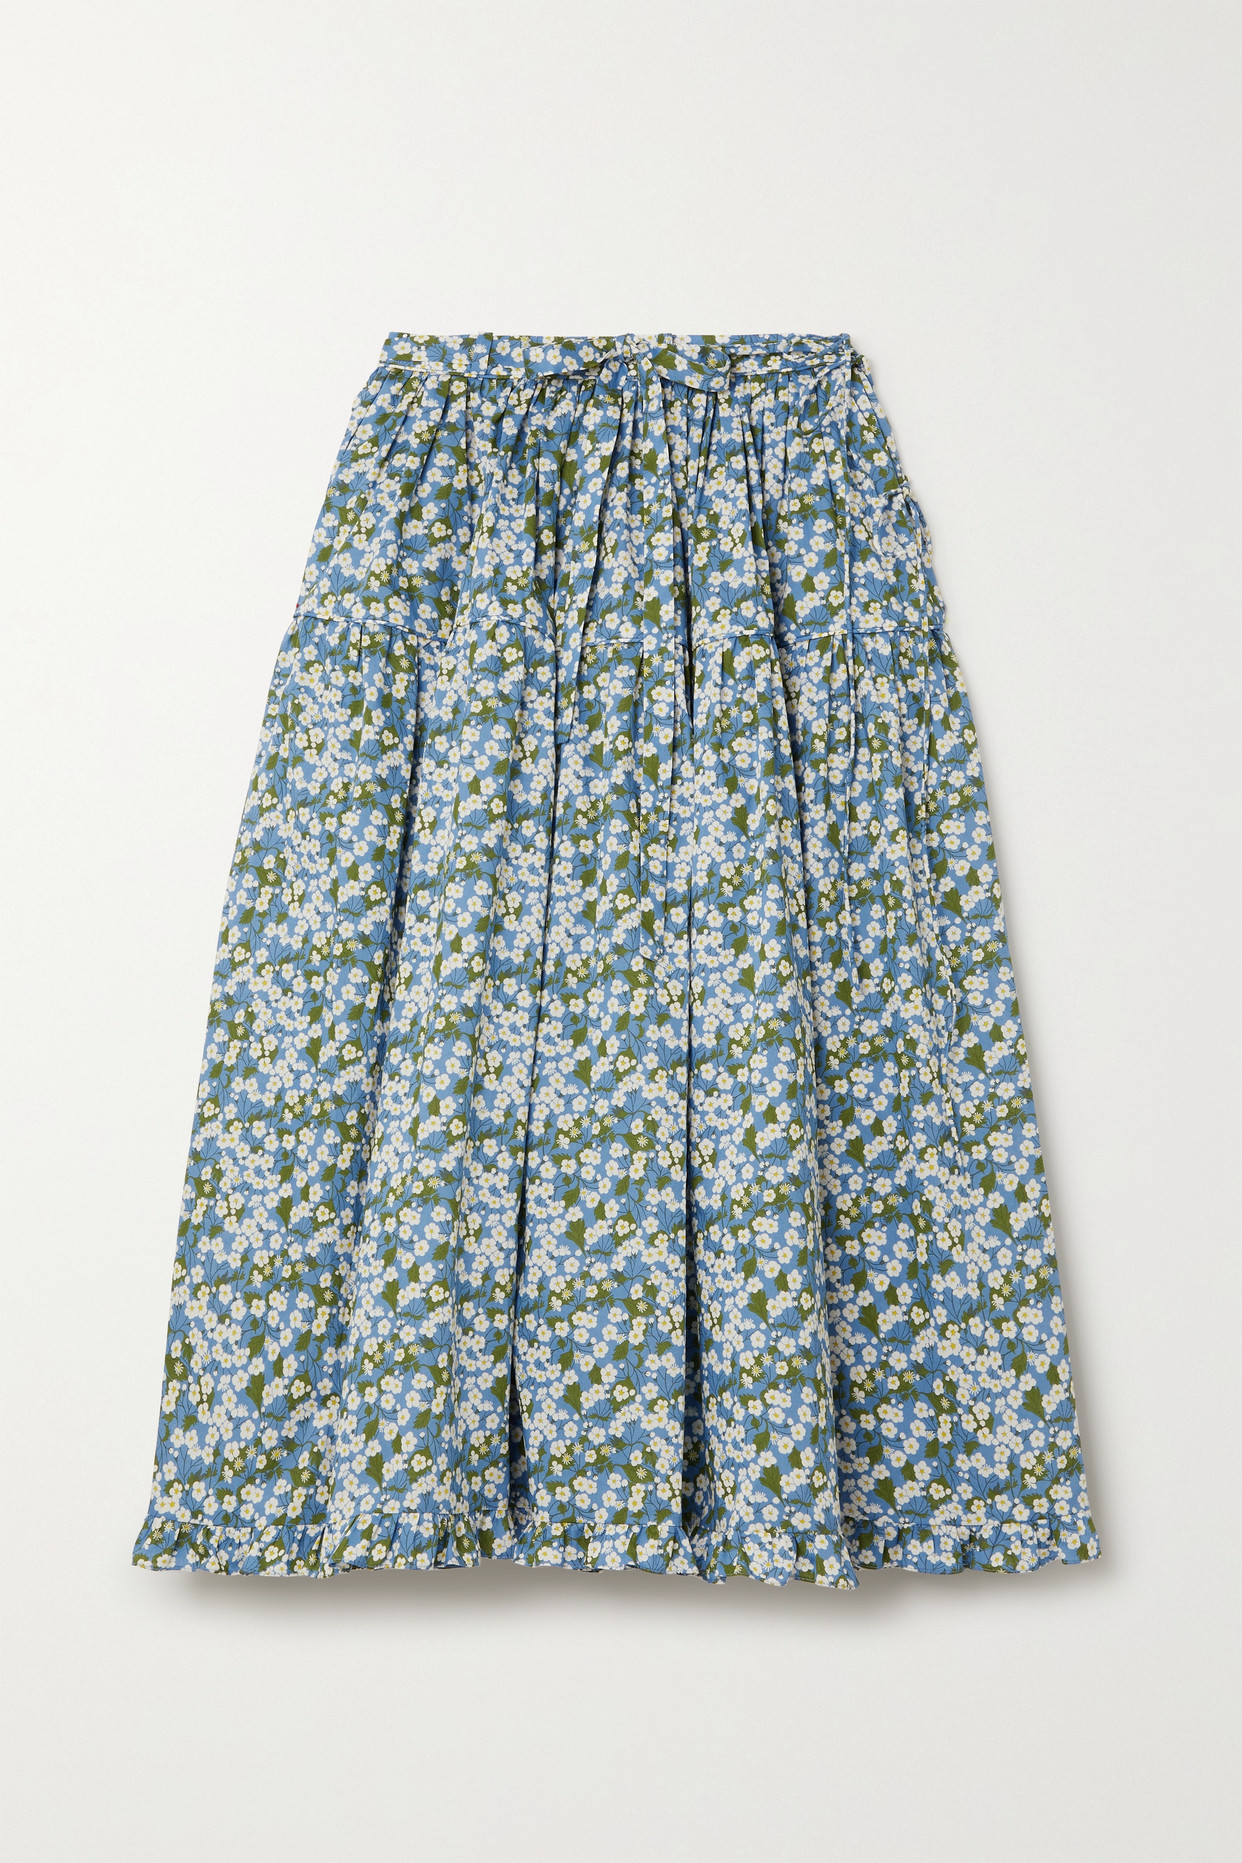 HORROR VACUI - Fritzi Floral-print Cotton-poplin Midi Skirt - Blue - large